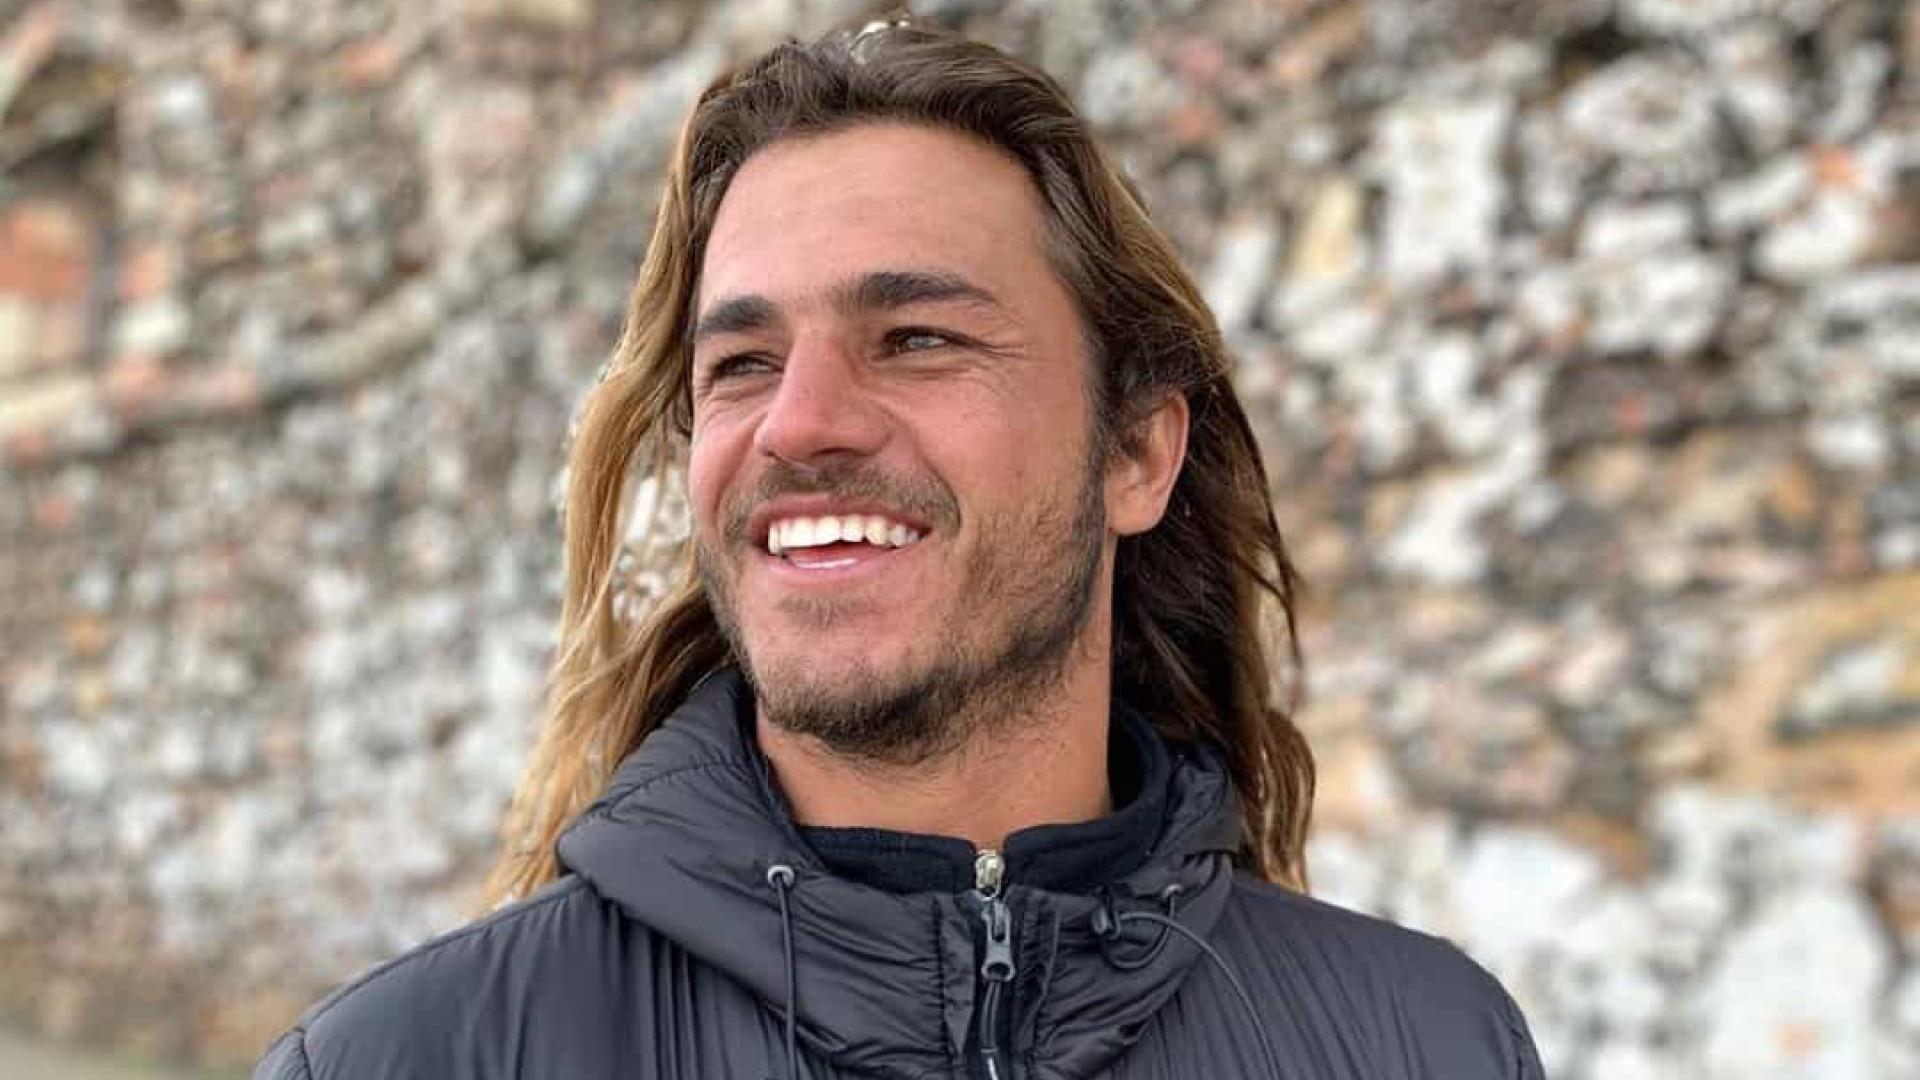 Surfista Caio Vaz passa sufoco na costa carioca